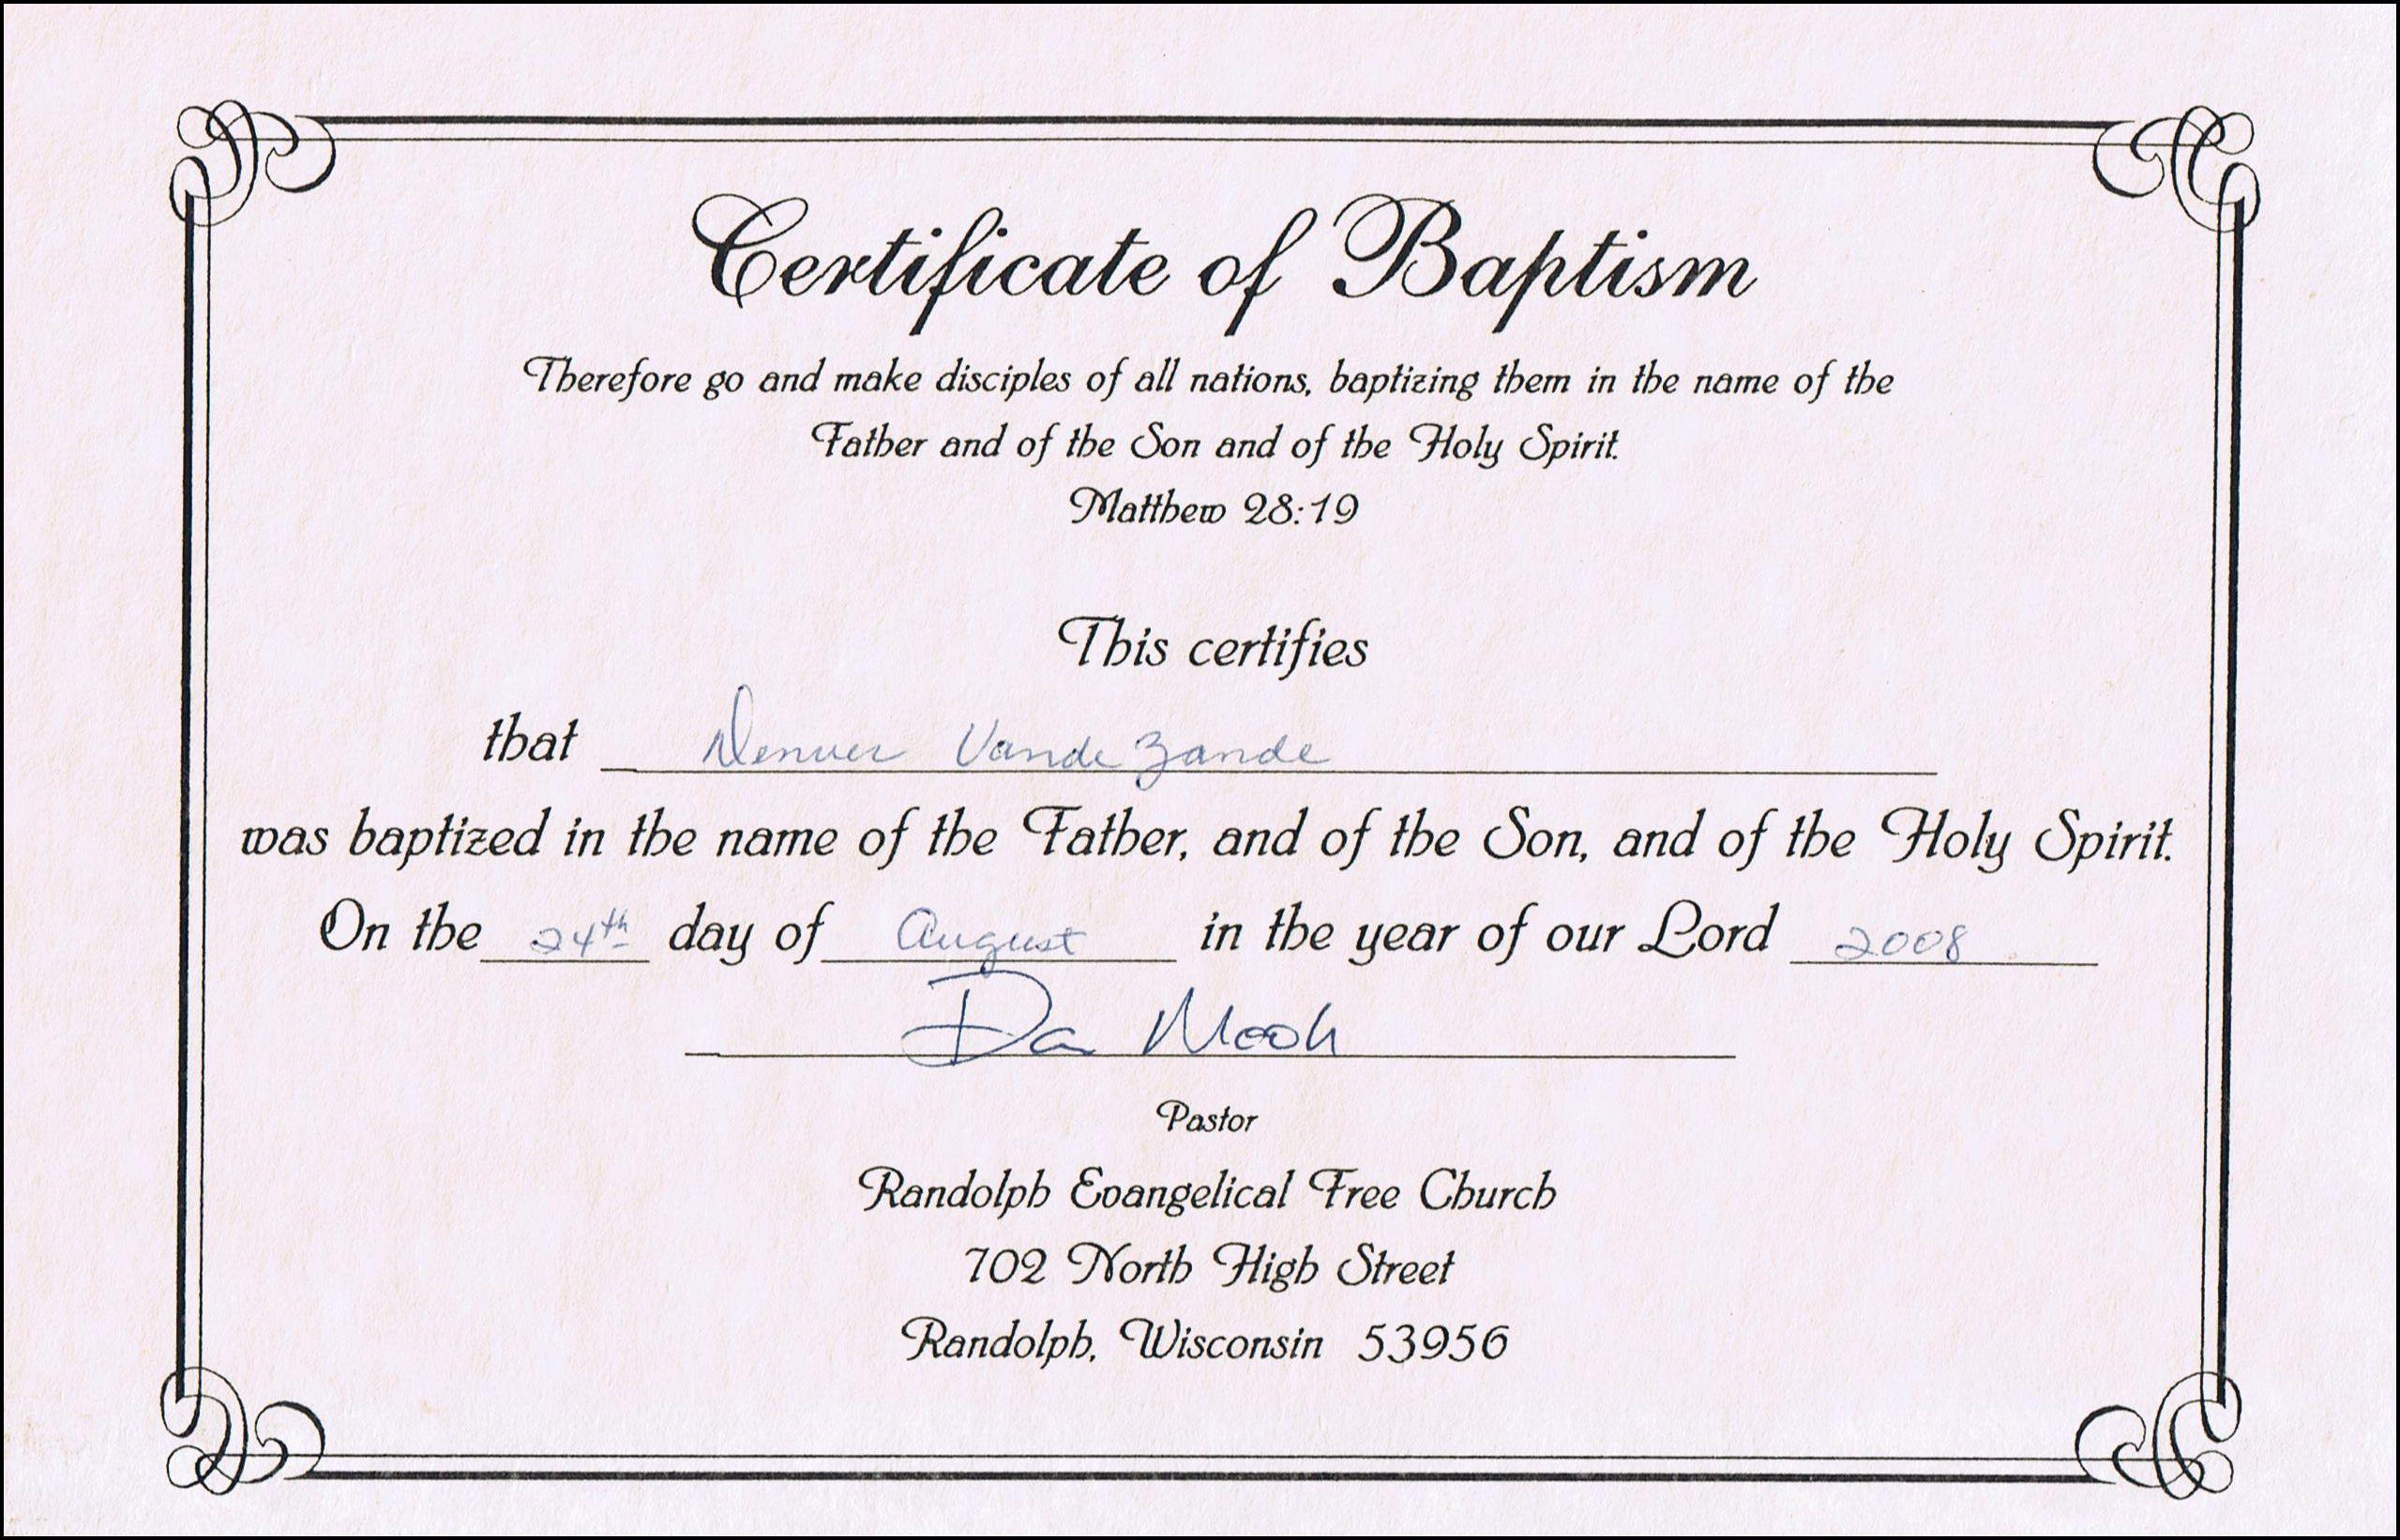 Baptism Certificates Free Online | Denver's Certificate Of Inside Baby Death Certificate Template